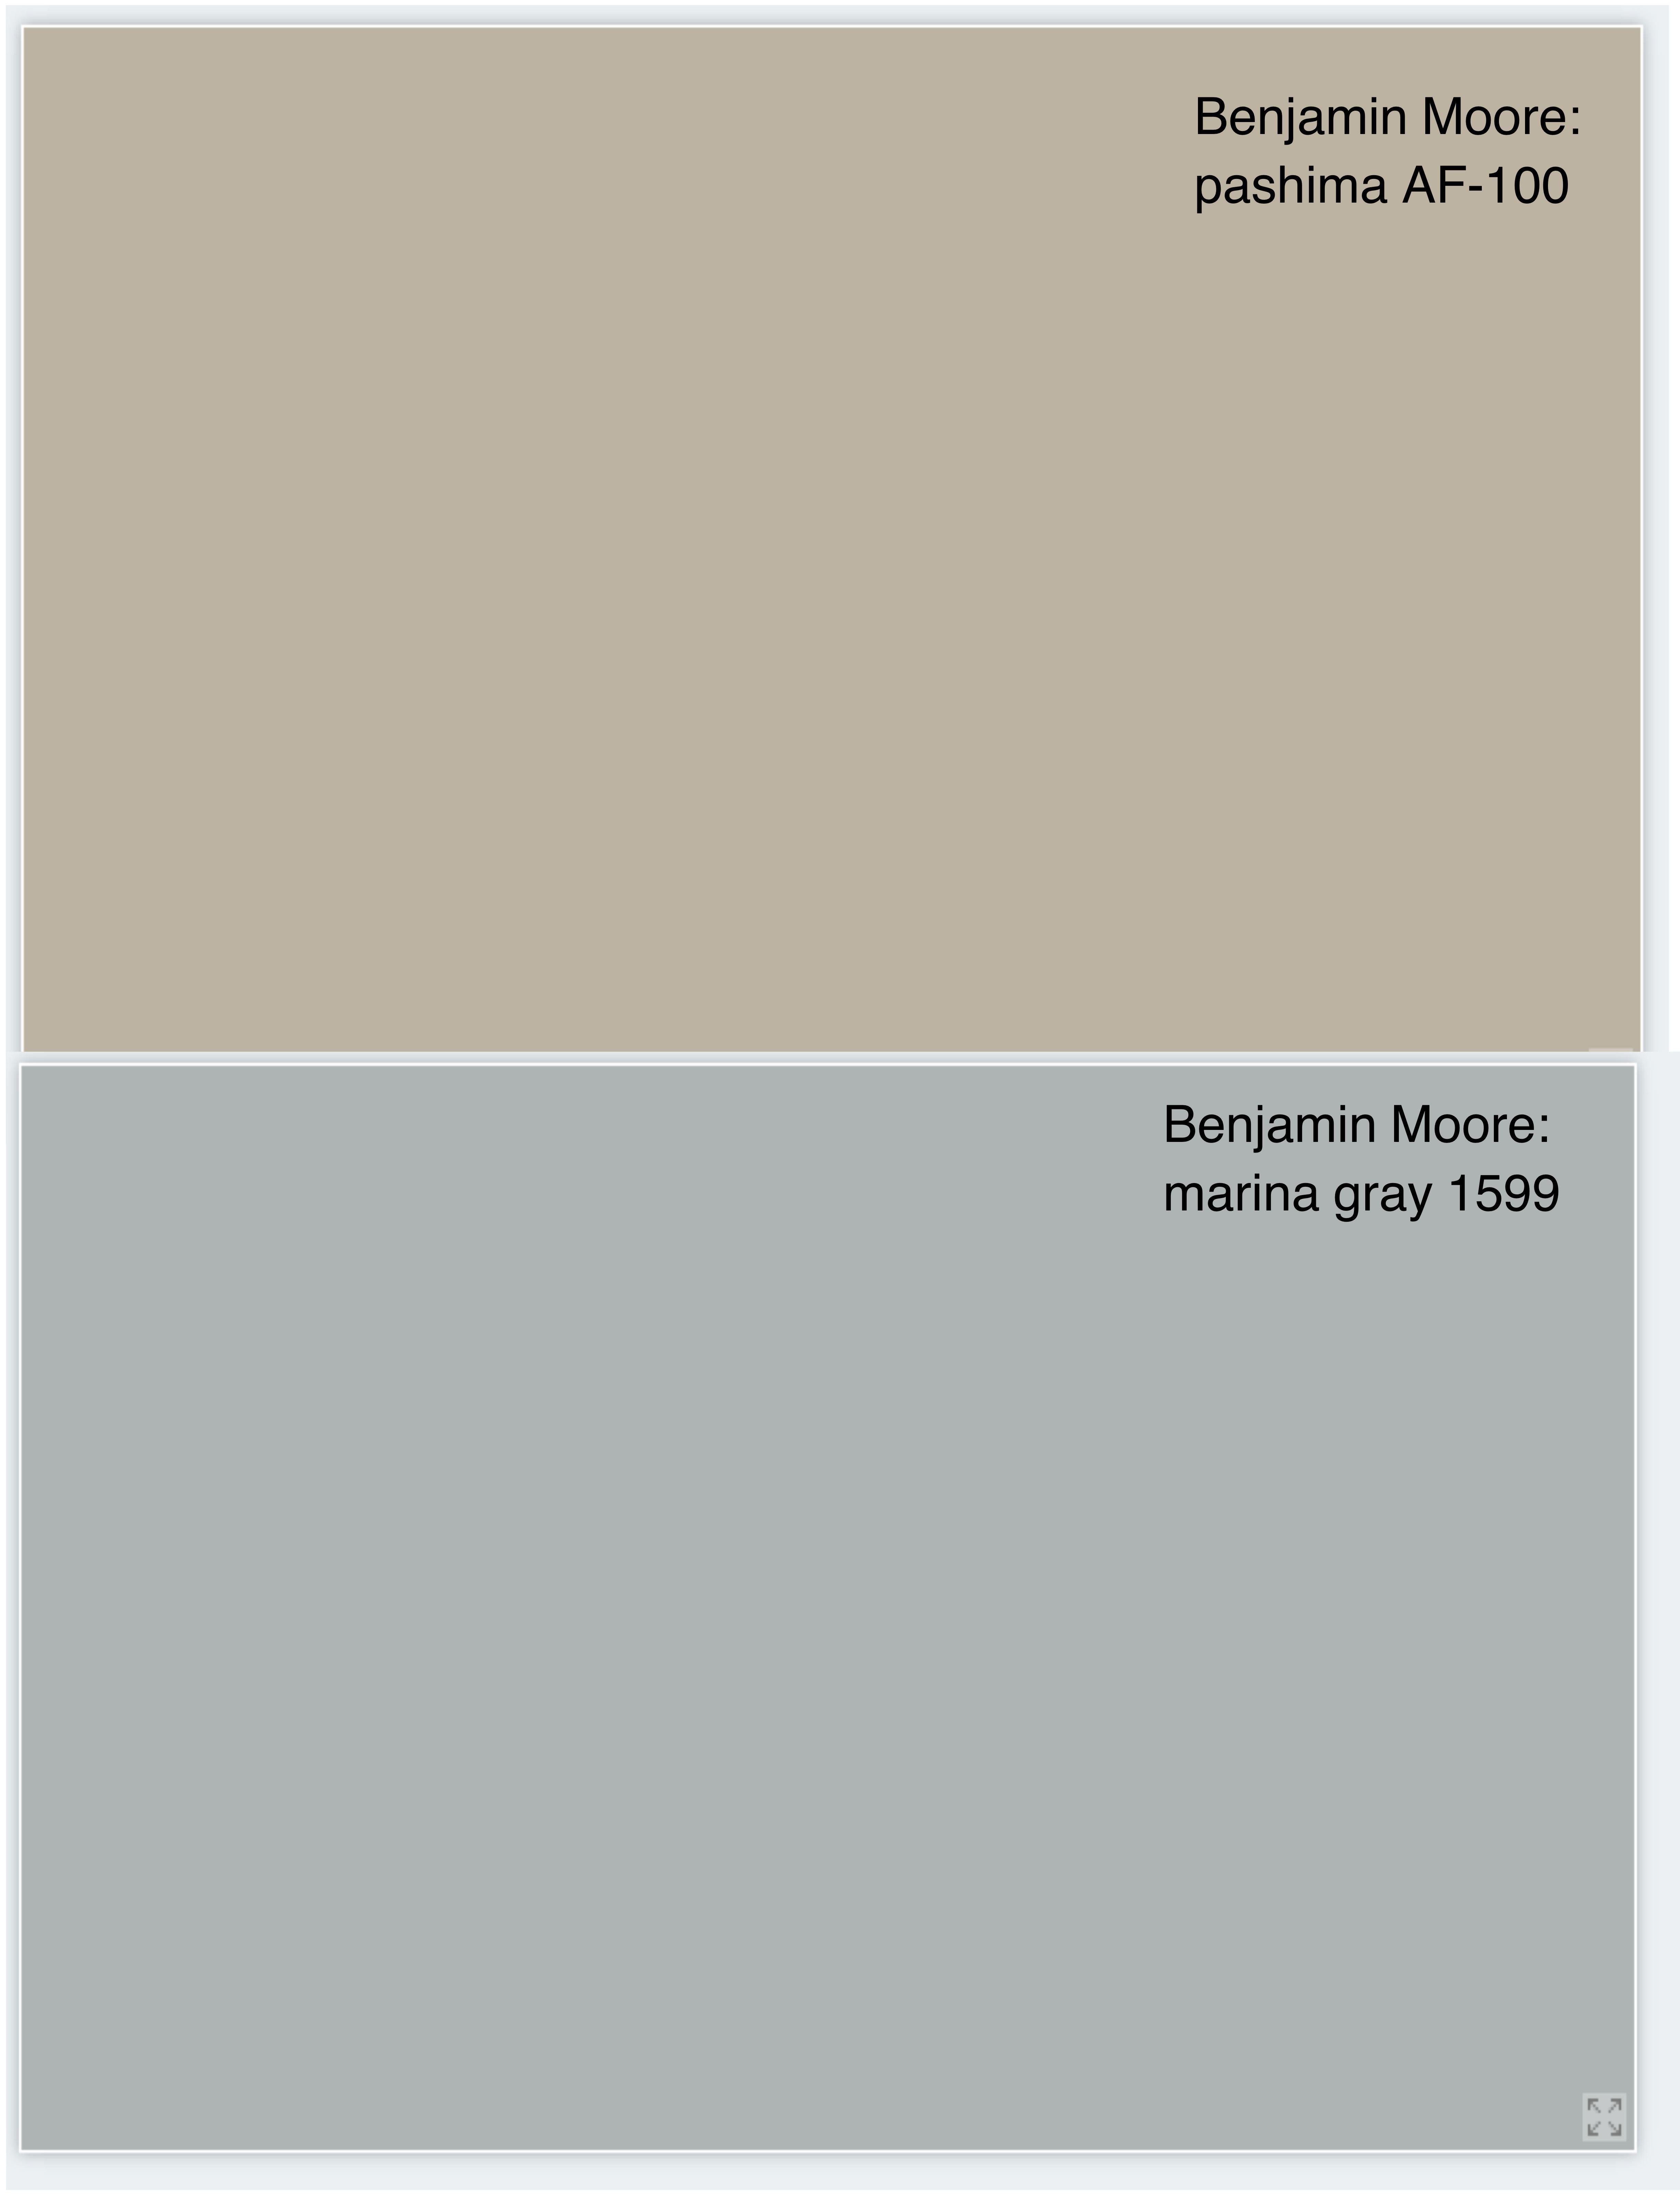 Benjamin Moore Pashmina Af 100 For Walls And Marina Gray